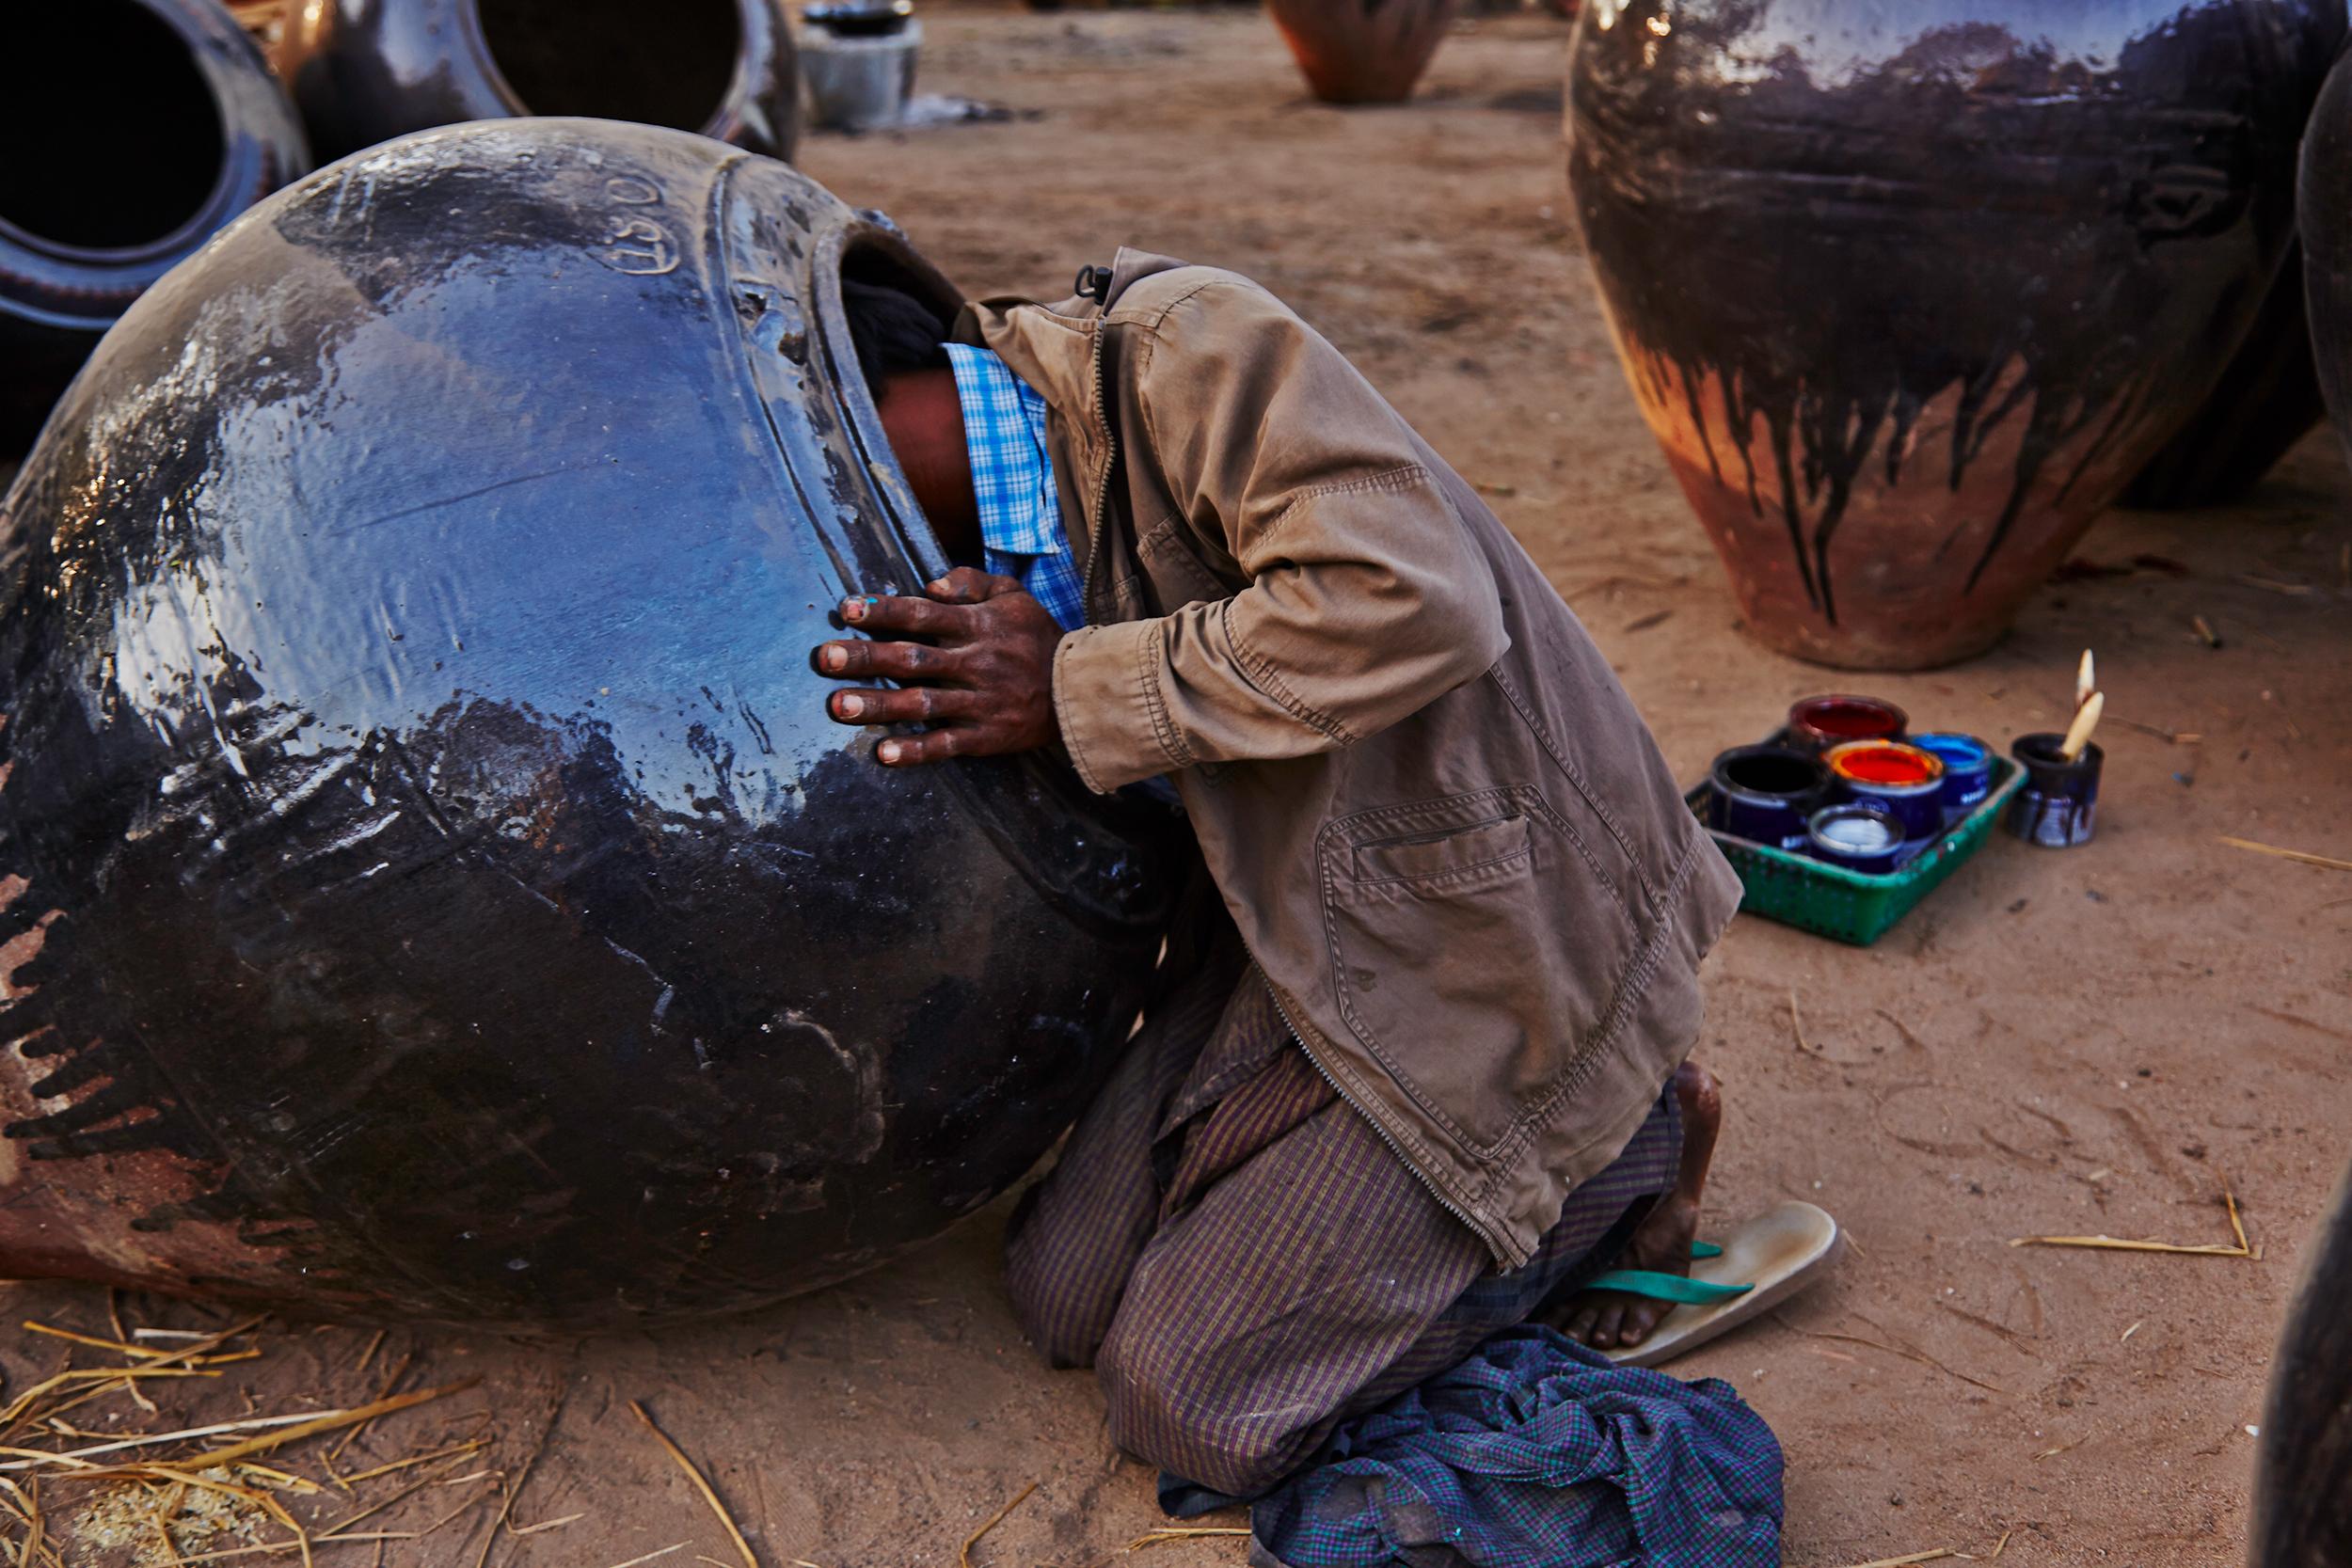 Kanjana-Chaiwatanachai-Image-Works_Bagan_2014.01.14_0310w.jpg